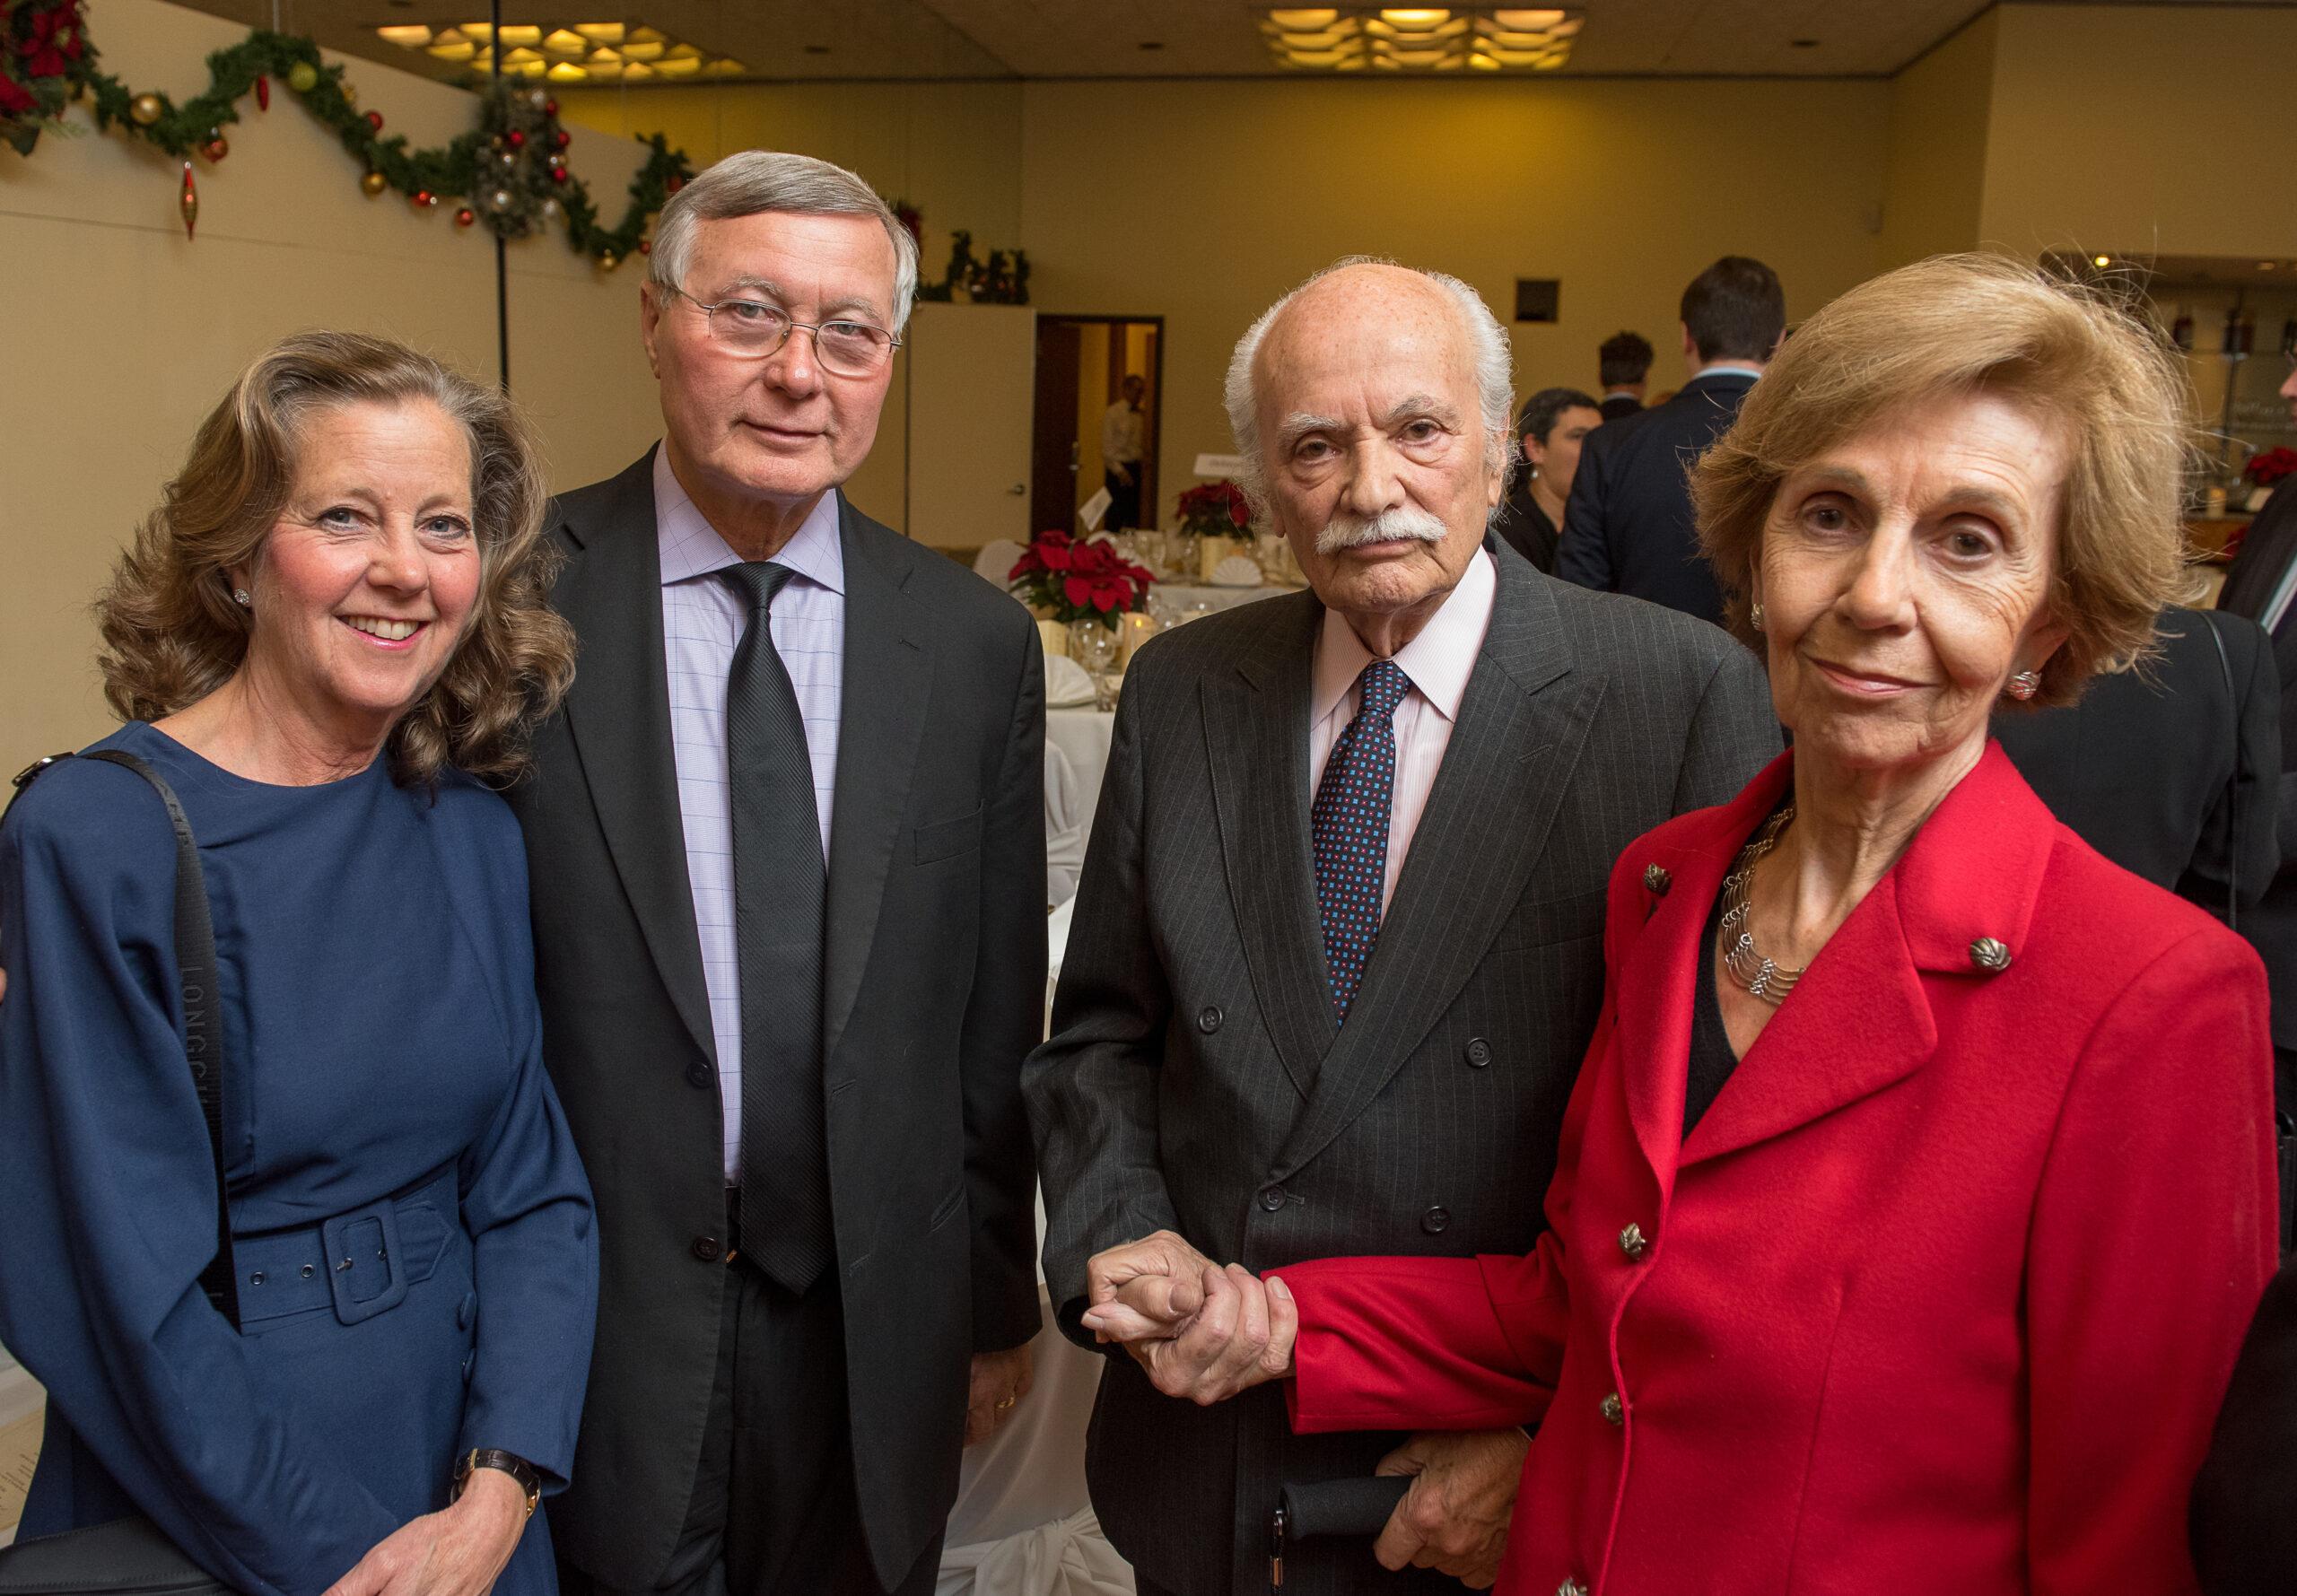 Mrs. Cathryn Németh, Dr. Imre Németh, Mr. Steven Teleki, Mrs. Beatriz Teleki